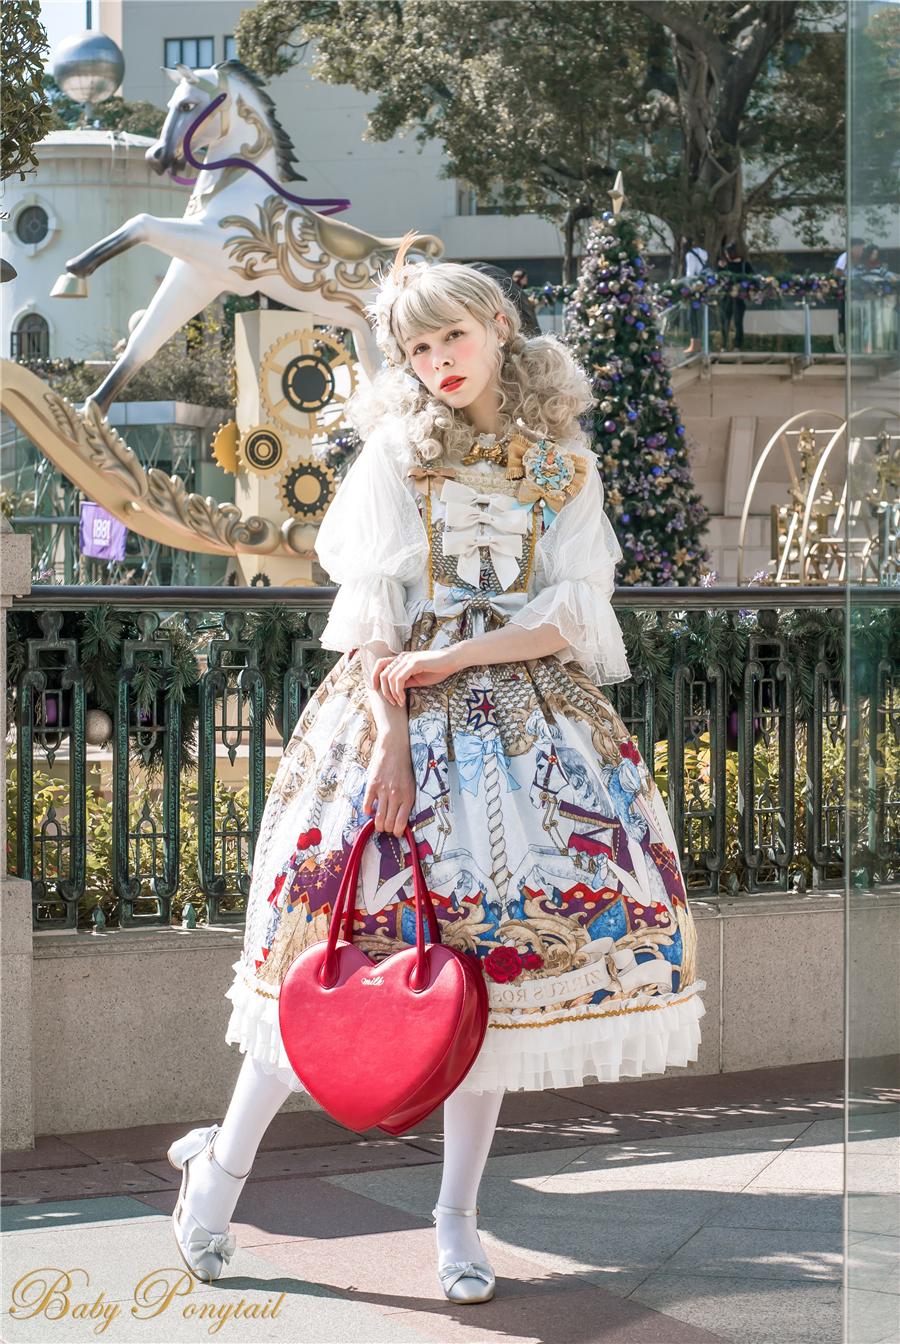 Baby Ponytail_Circus Princess_Silver JSK_Claudia03.jpg